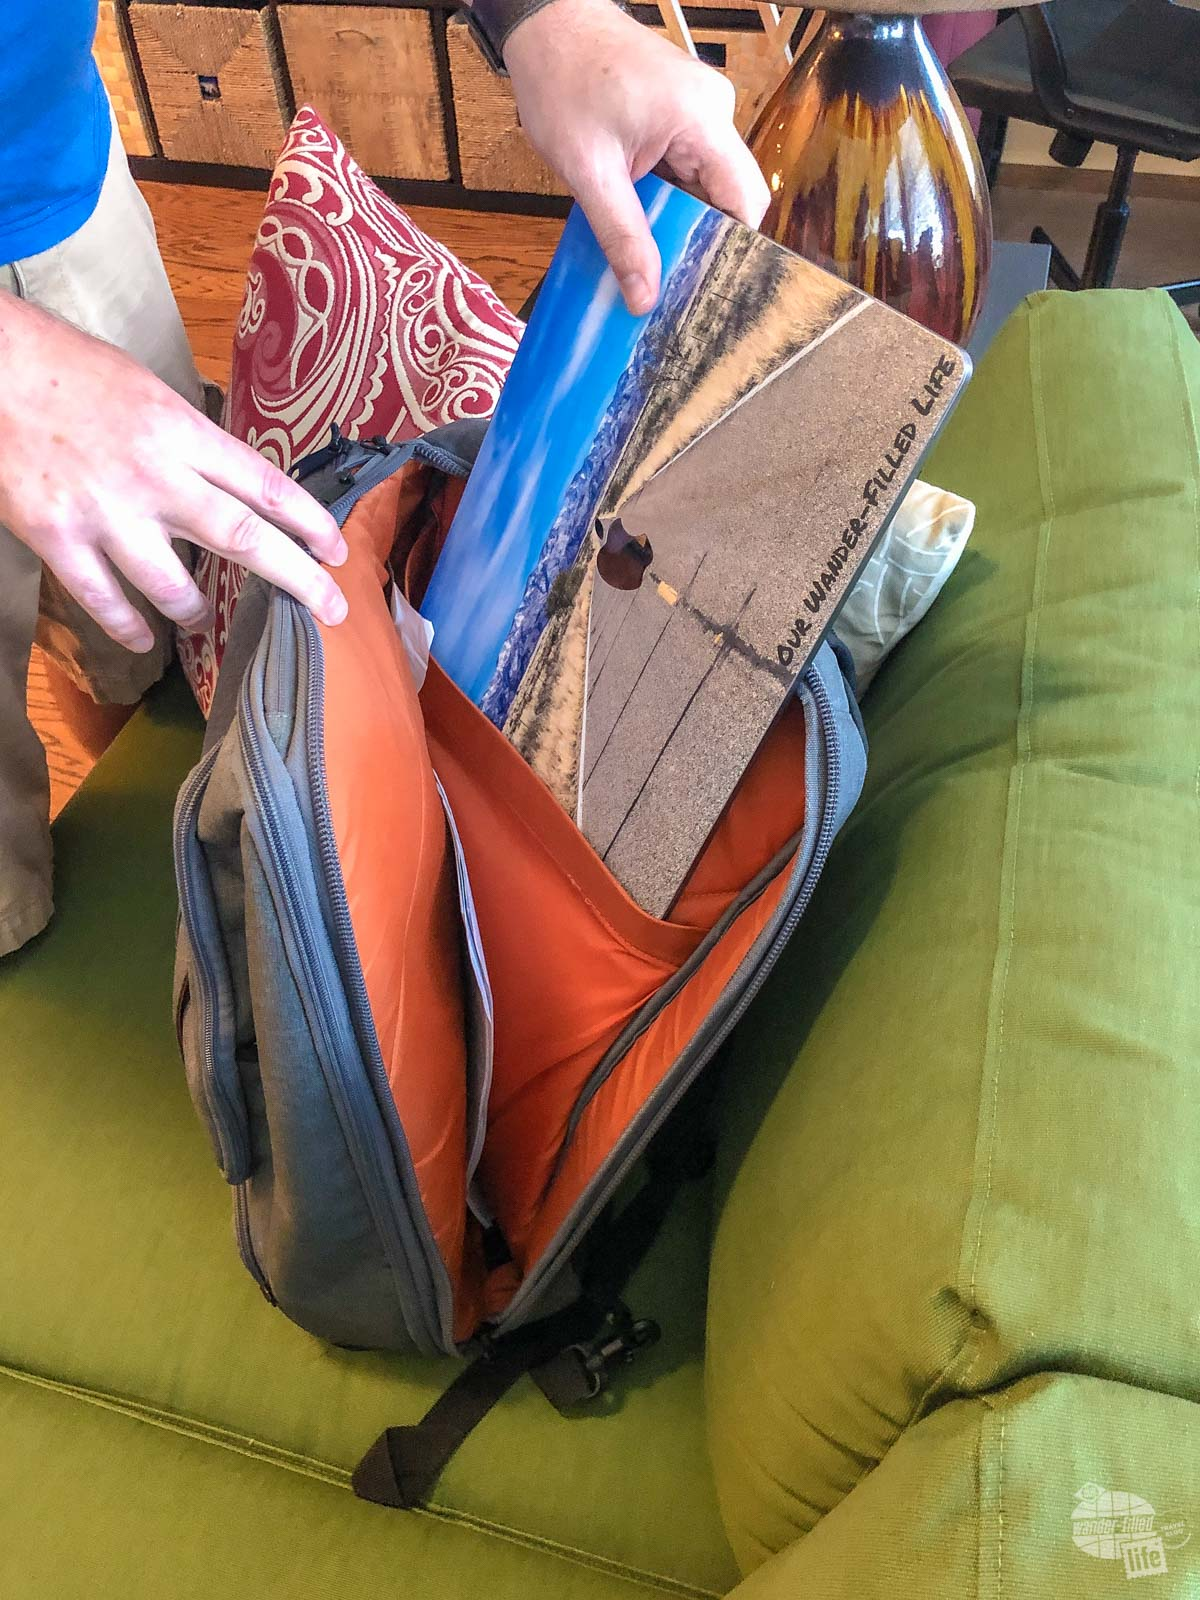 Inside the eBags Professional Slim Laptop Backpack.